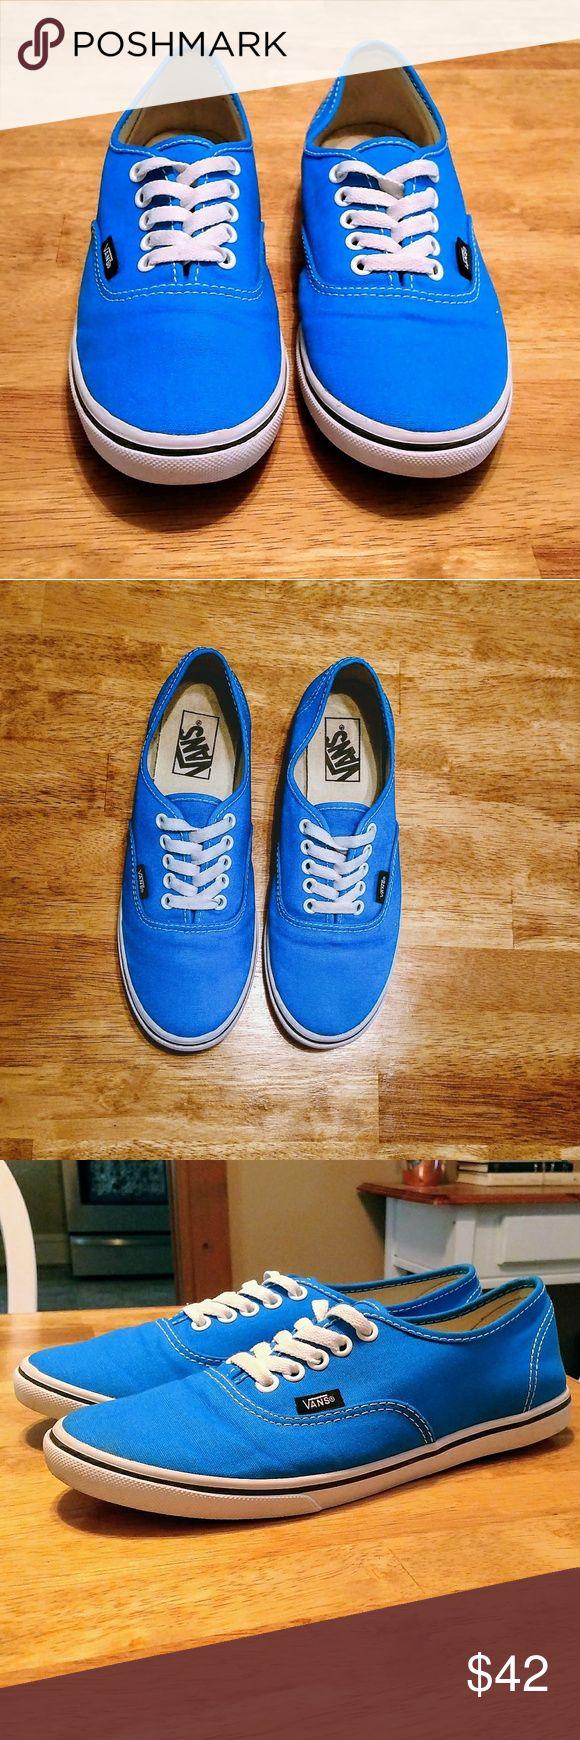 Brand New without box!!! Beautiful blue Vans shoes Mint condition never worn. Beautiful blue color canvas slip on sneakers!!! Women's size 8. Men's size 6.5 Vans Shoes